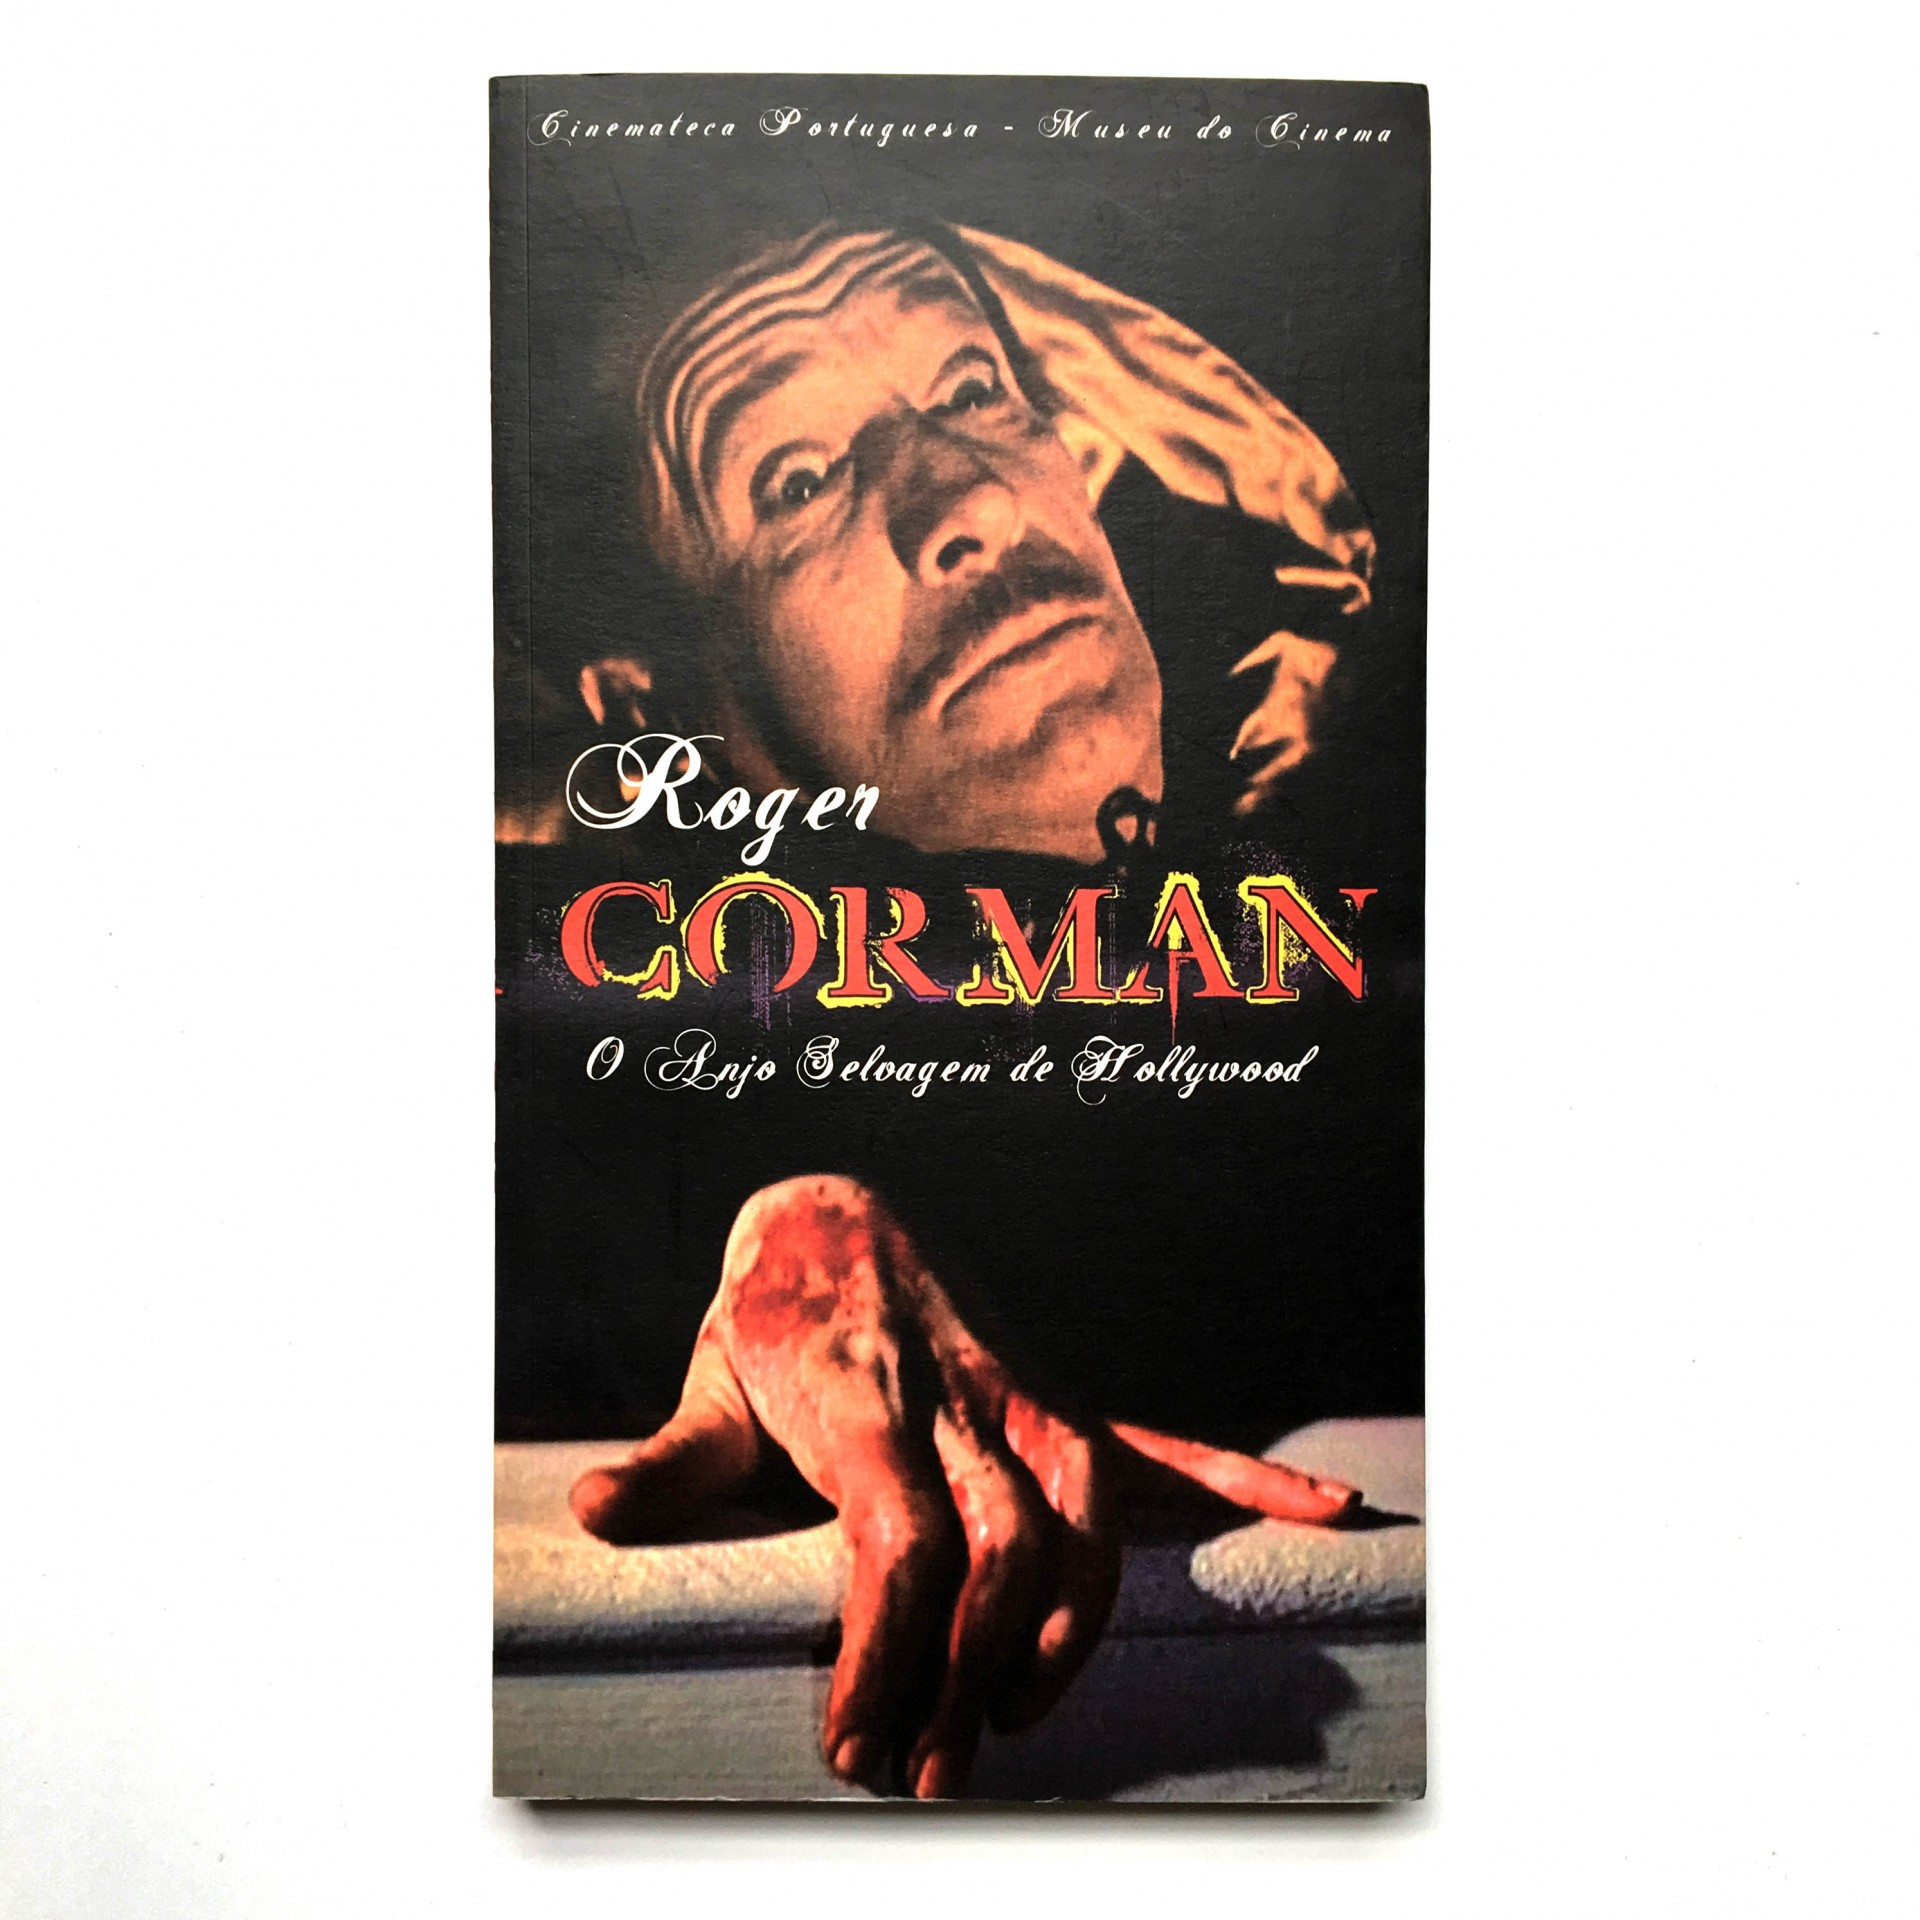 Roger Corman: o anjo selvagem de Hollywood